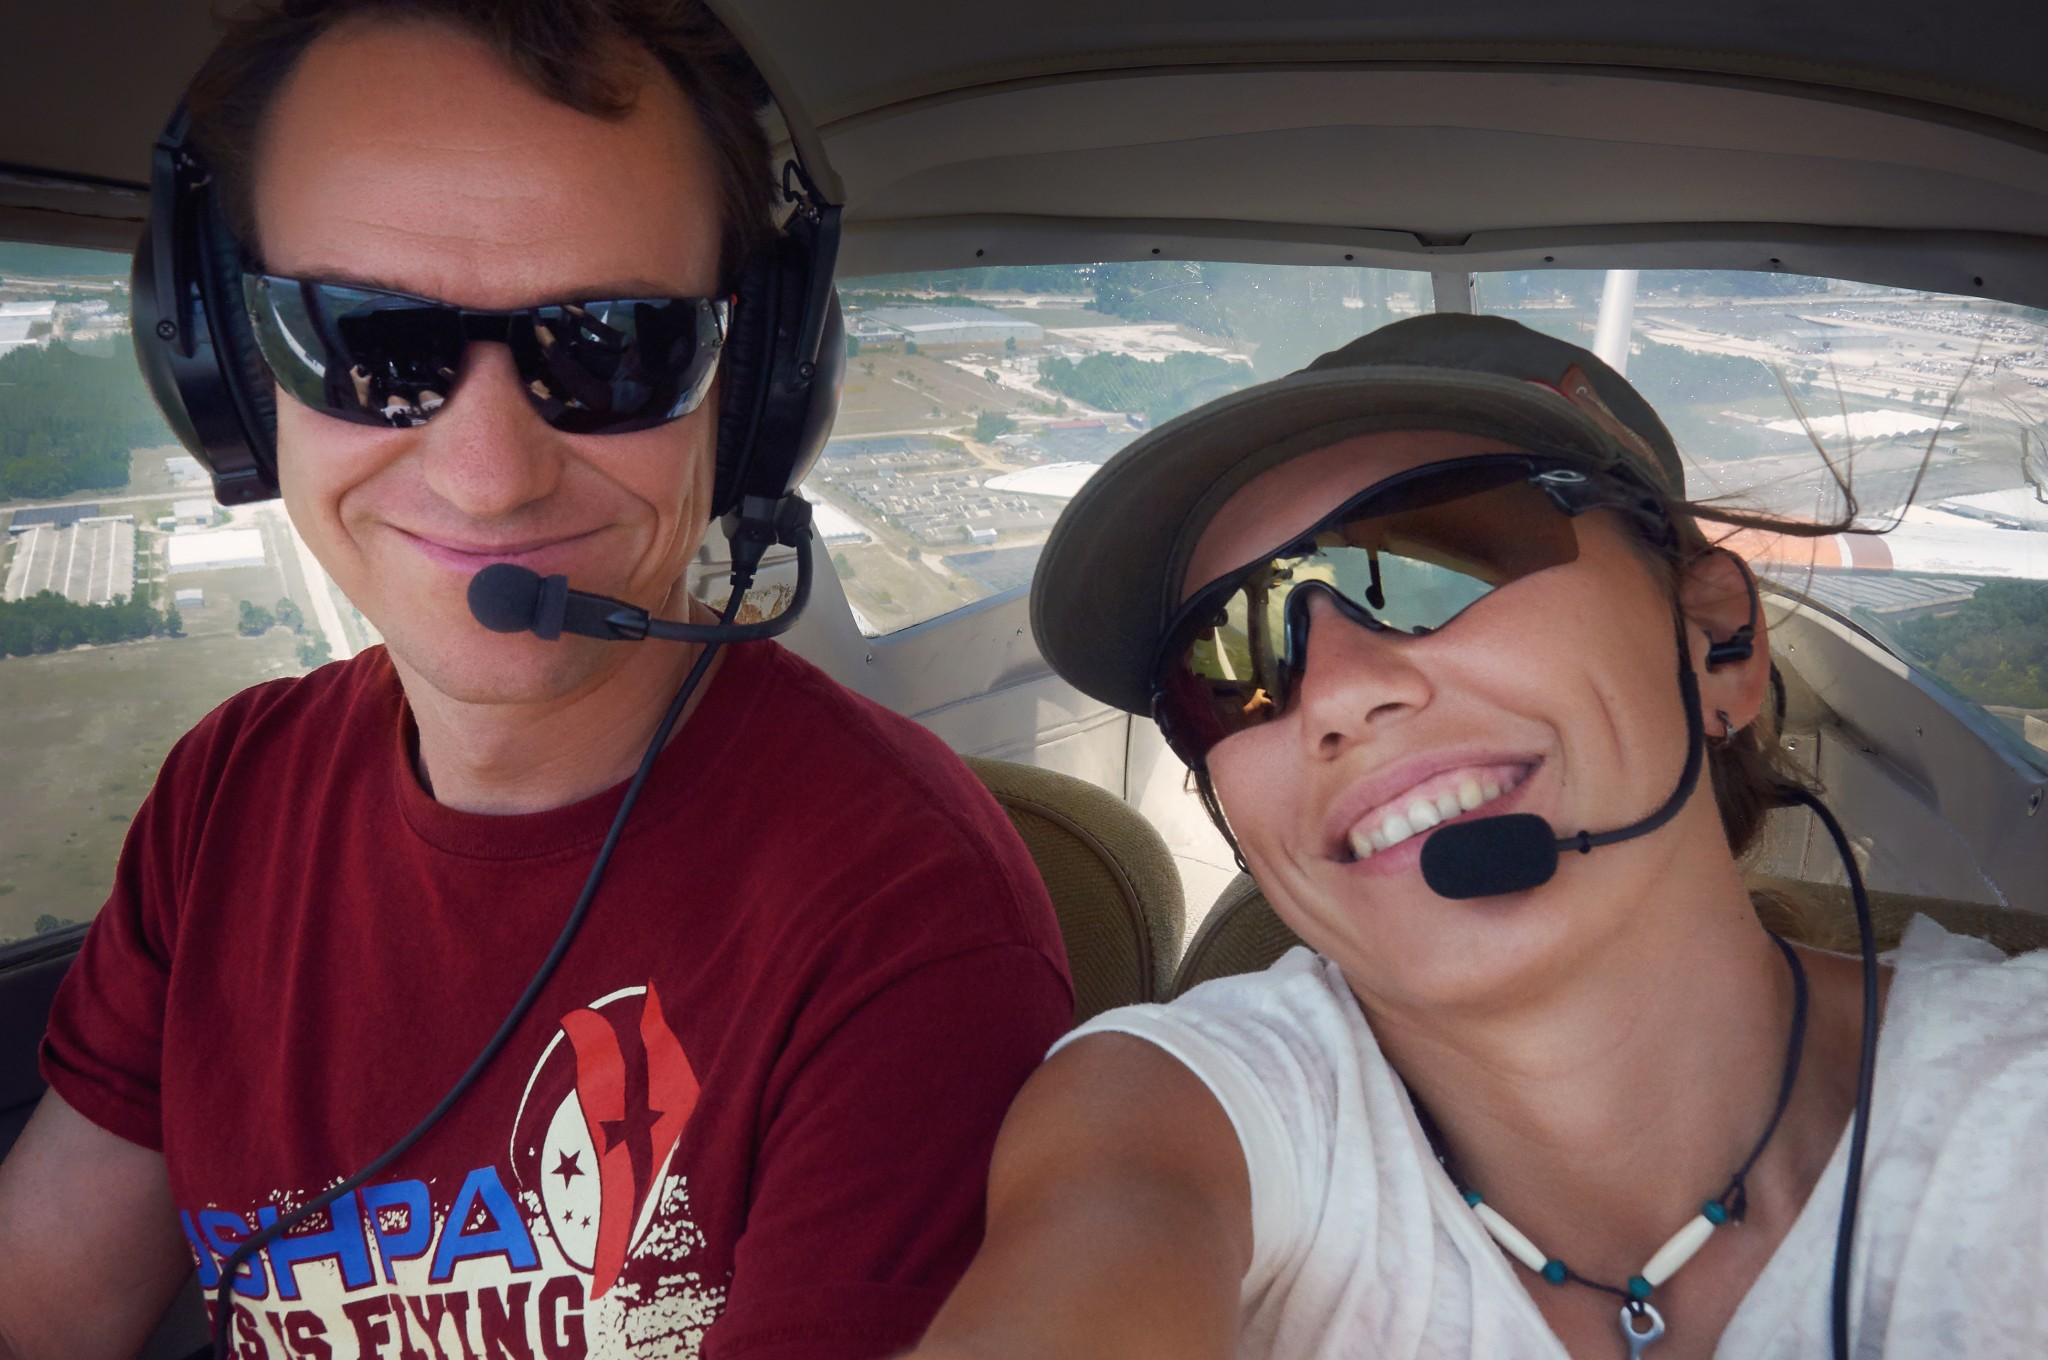 How we became private pilots in the United States. Pt.1 - Как мы учились в США на частных пилотов. Часть 1